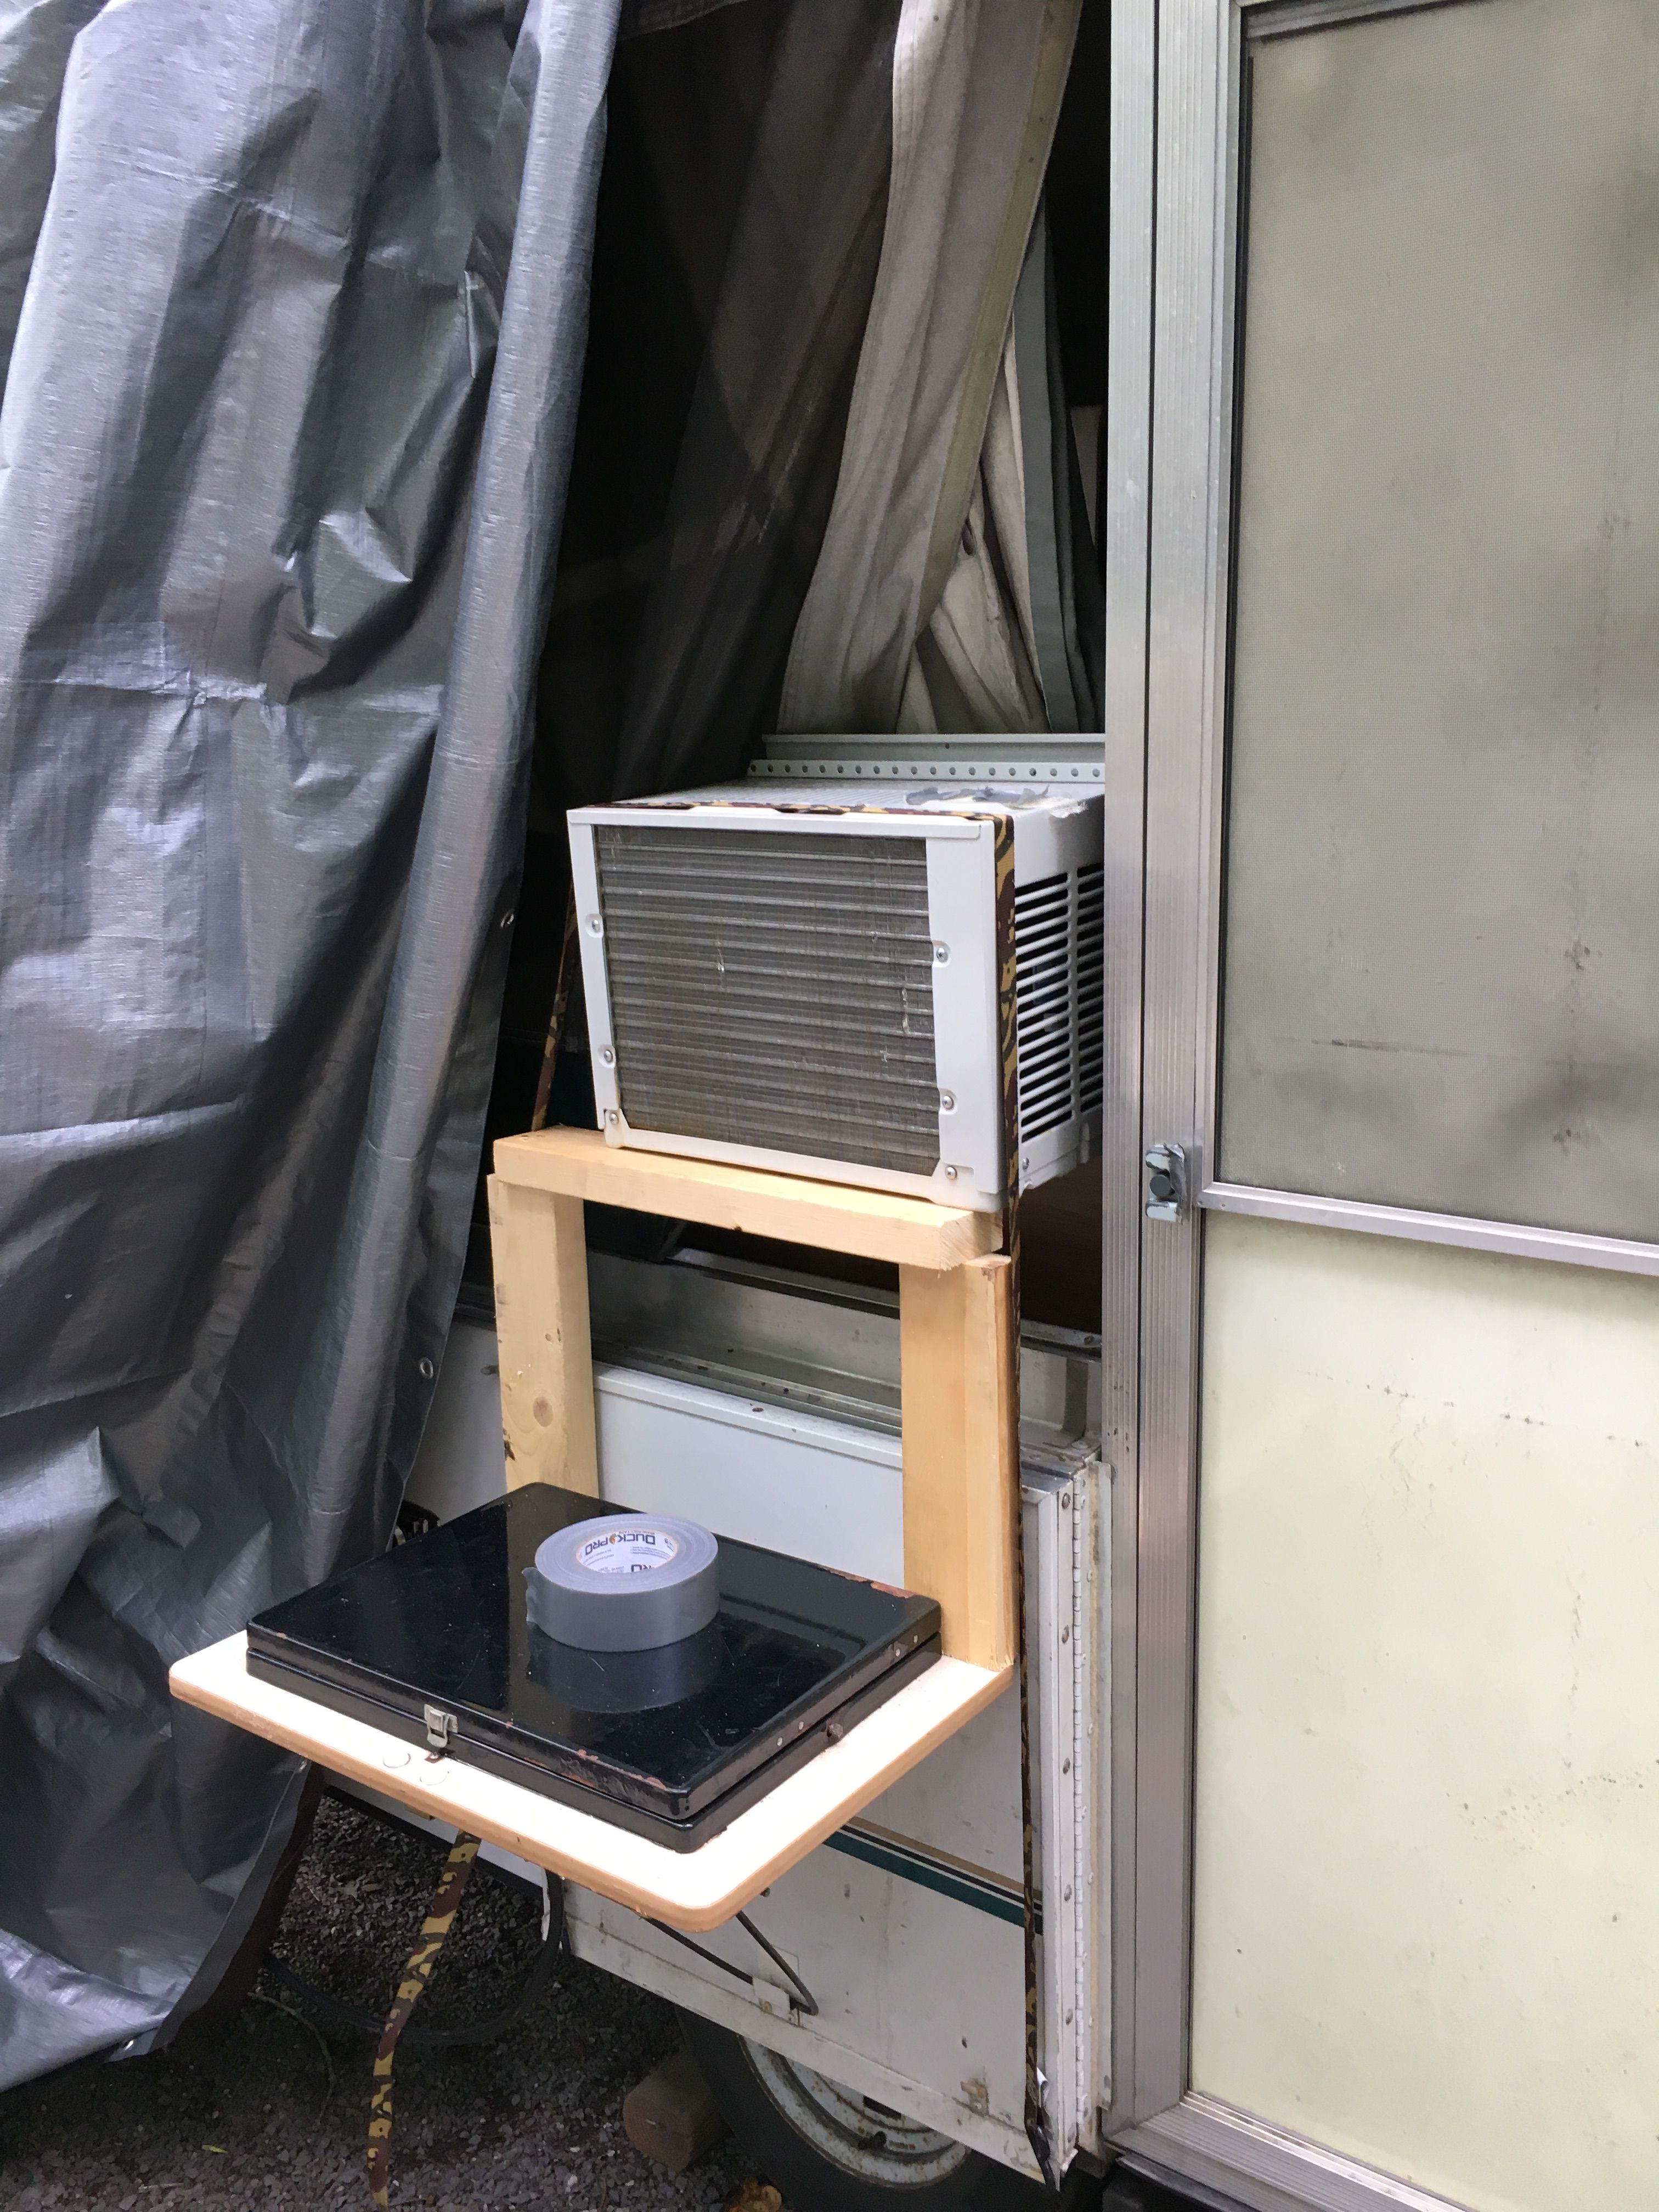 Window air conditioner in Coleman camper Pop up camper